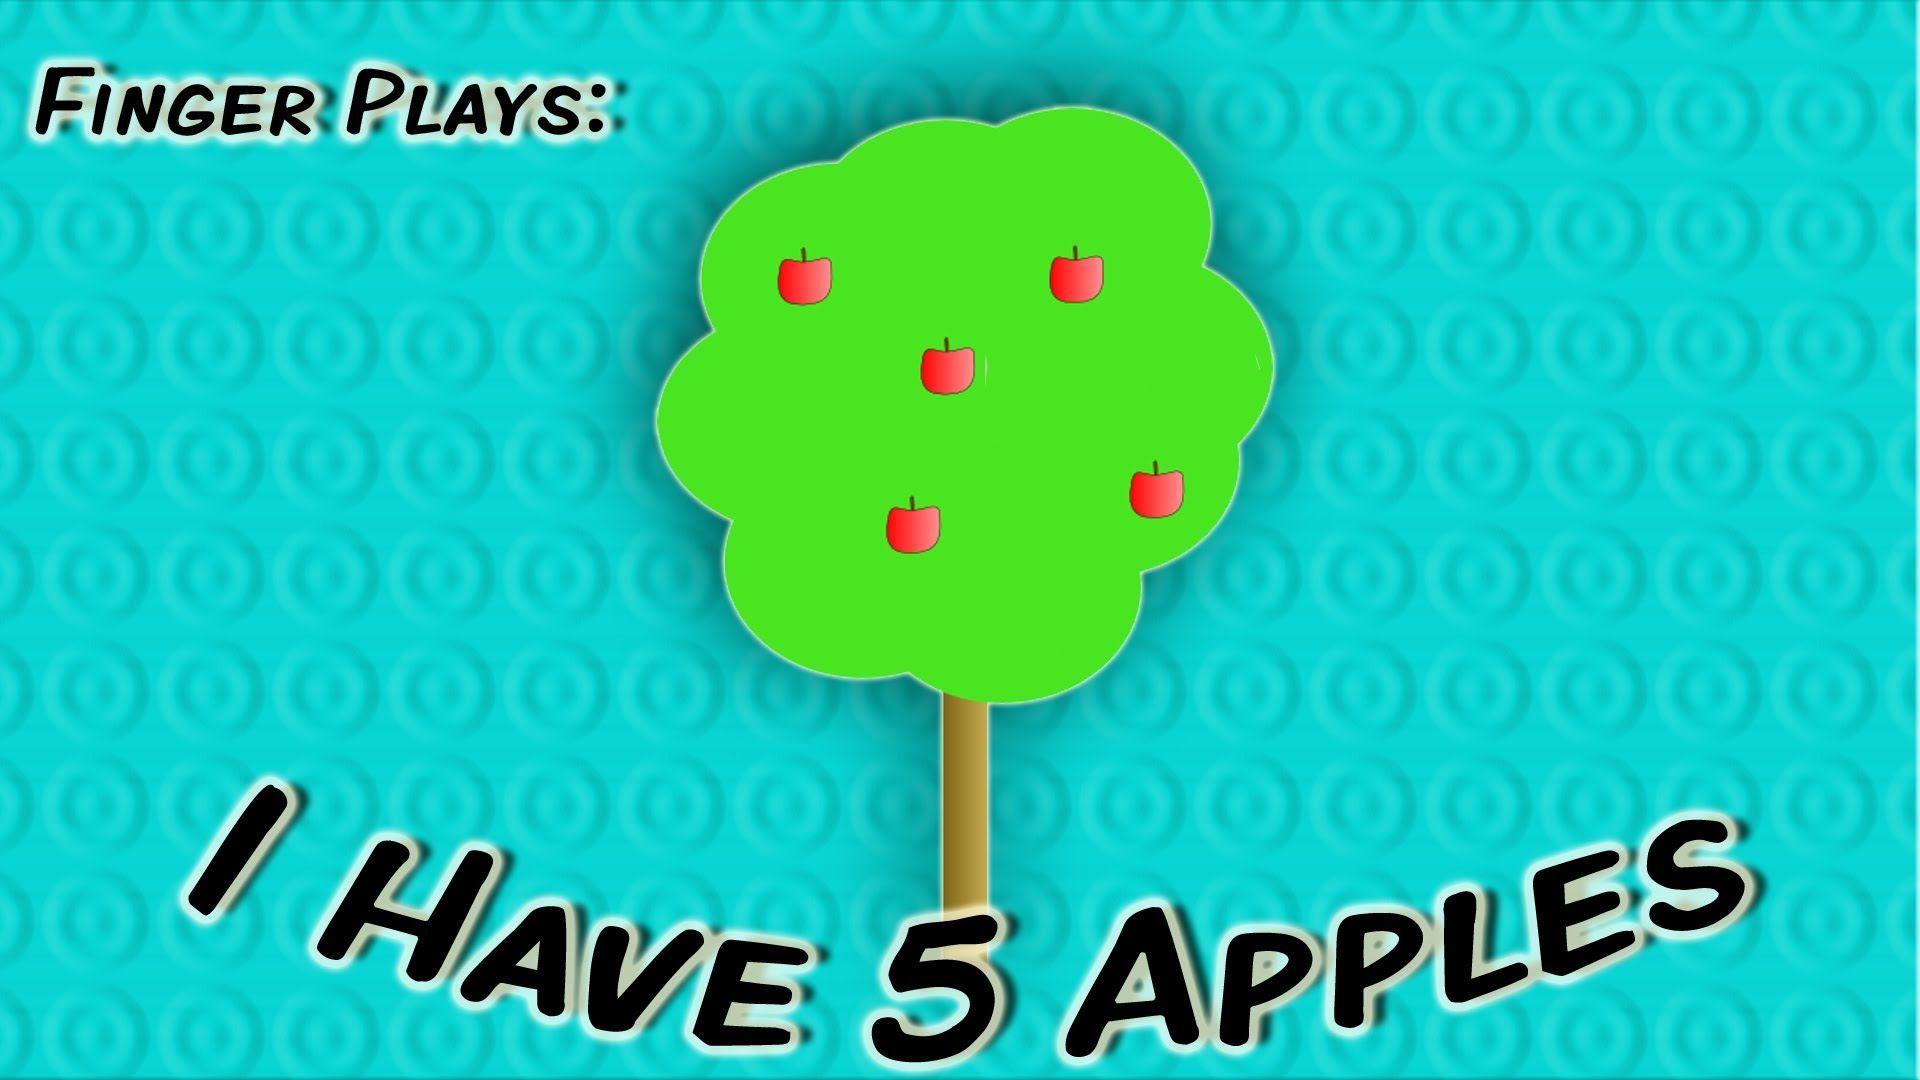 I Have 5 Apples | finger play song for children | Lesson Plans ...